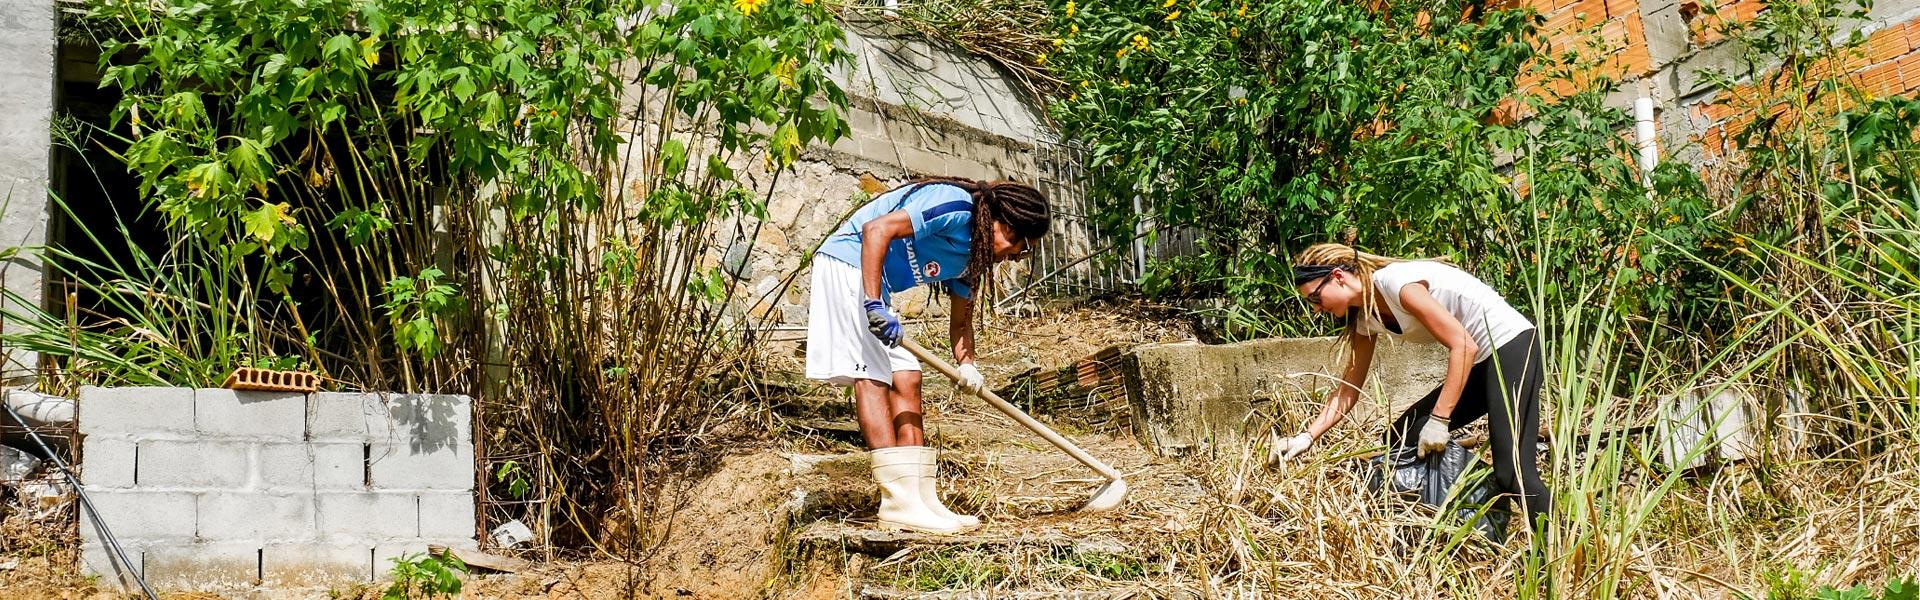 Rasta couple working in garden in Florianópolis, Brazil